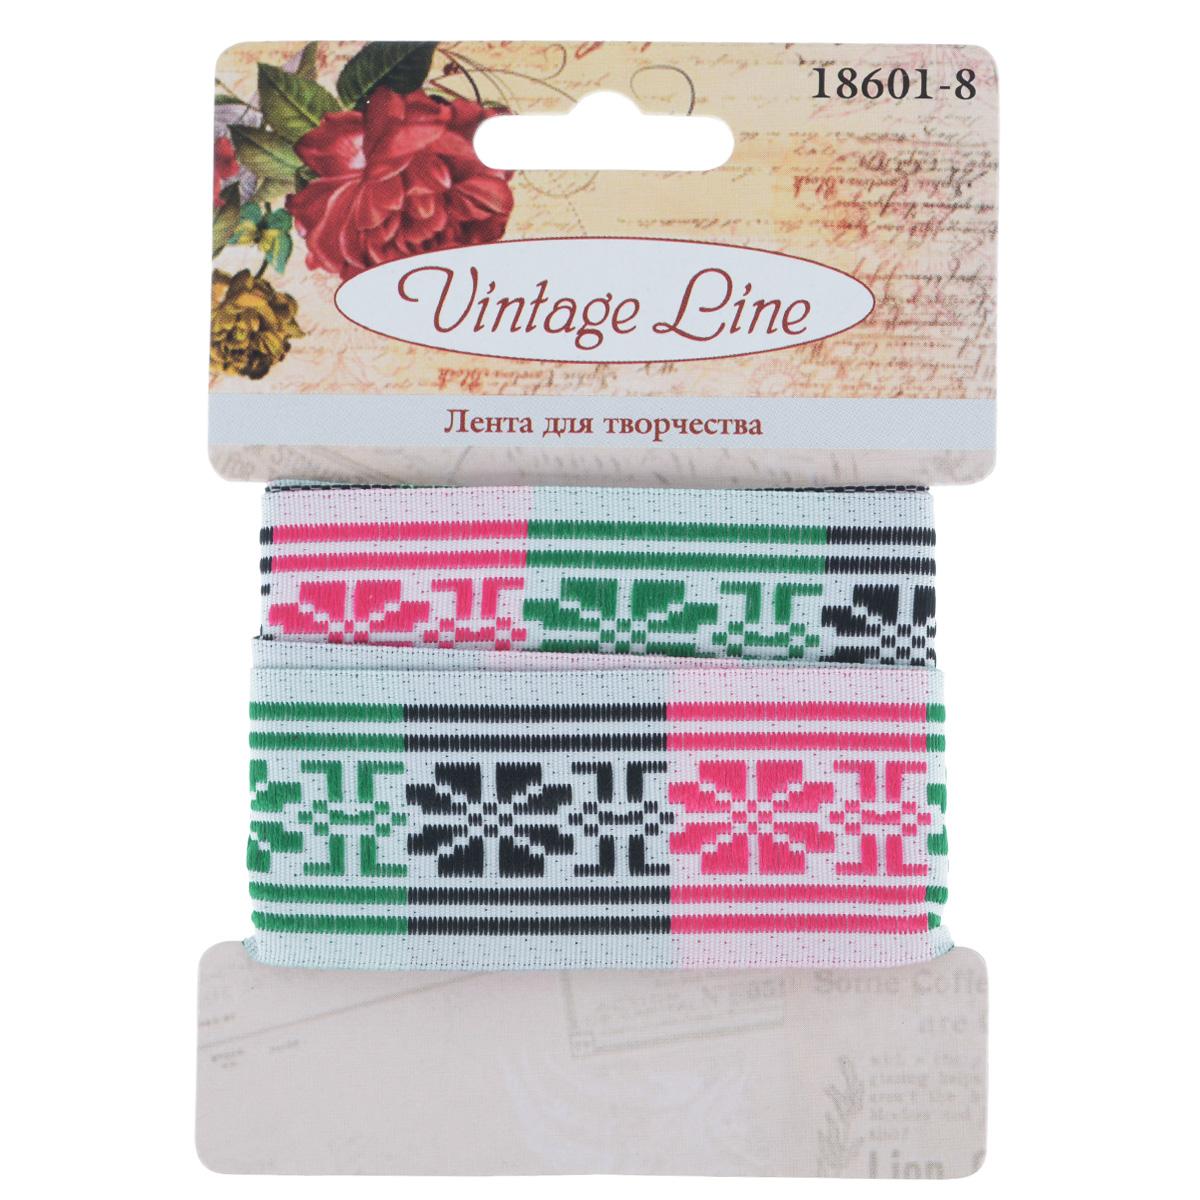 ����� ������������ Vintage Line, ������ 3 ��, ����� 1 �. 7709656 - Vintage Line7709656������������ ����� Vintage Line ��������� �� �������� � ��������� ������������ ����������. ����� ����� �������� �������� ��� ���������� ��������� ���������� ����� �����, ��� �����������, ����������, ����� ������� � �������� � ������ ������. ����� ���������� �������� ��������� � �������������. ��� ������ ����������� ��������� � �������� ������������ �������. ������: 3 ��. �����: 1 �.